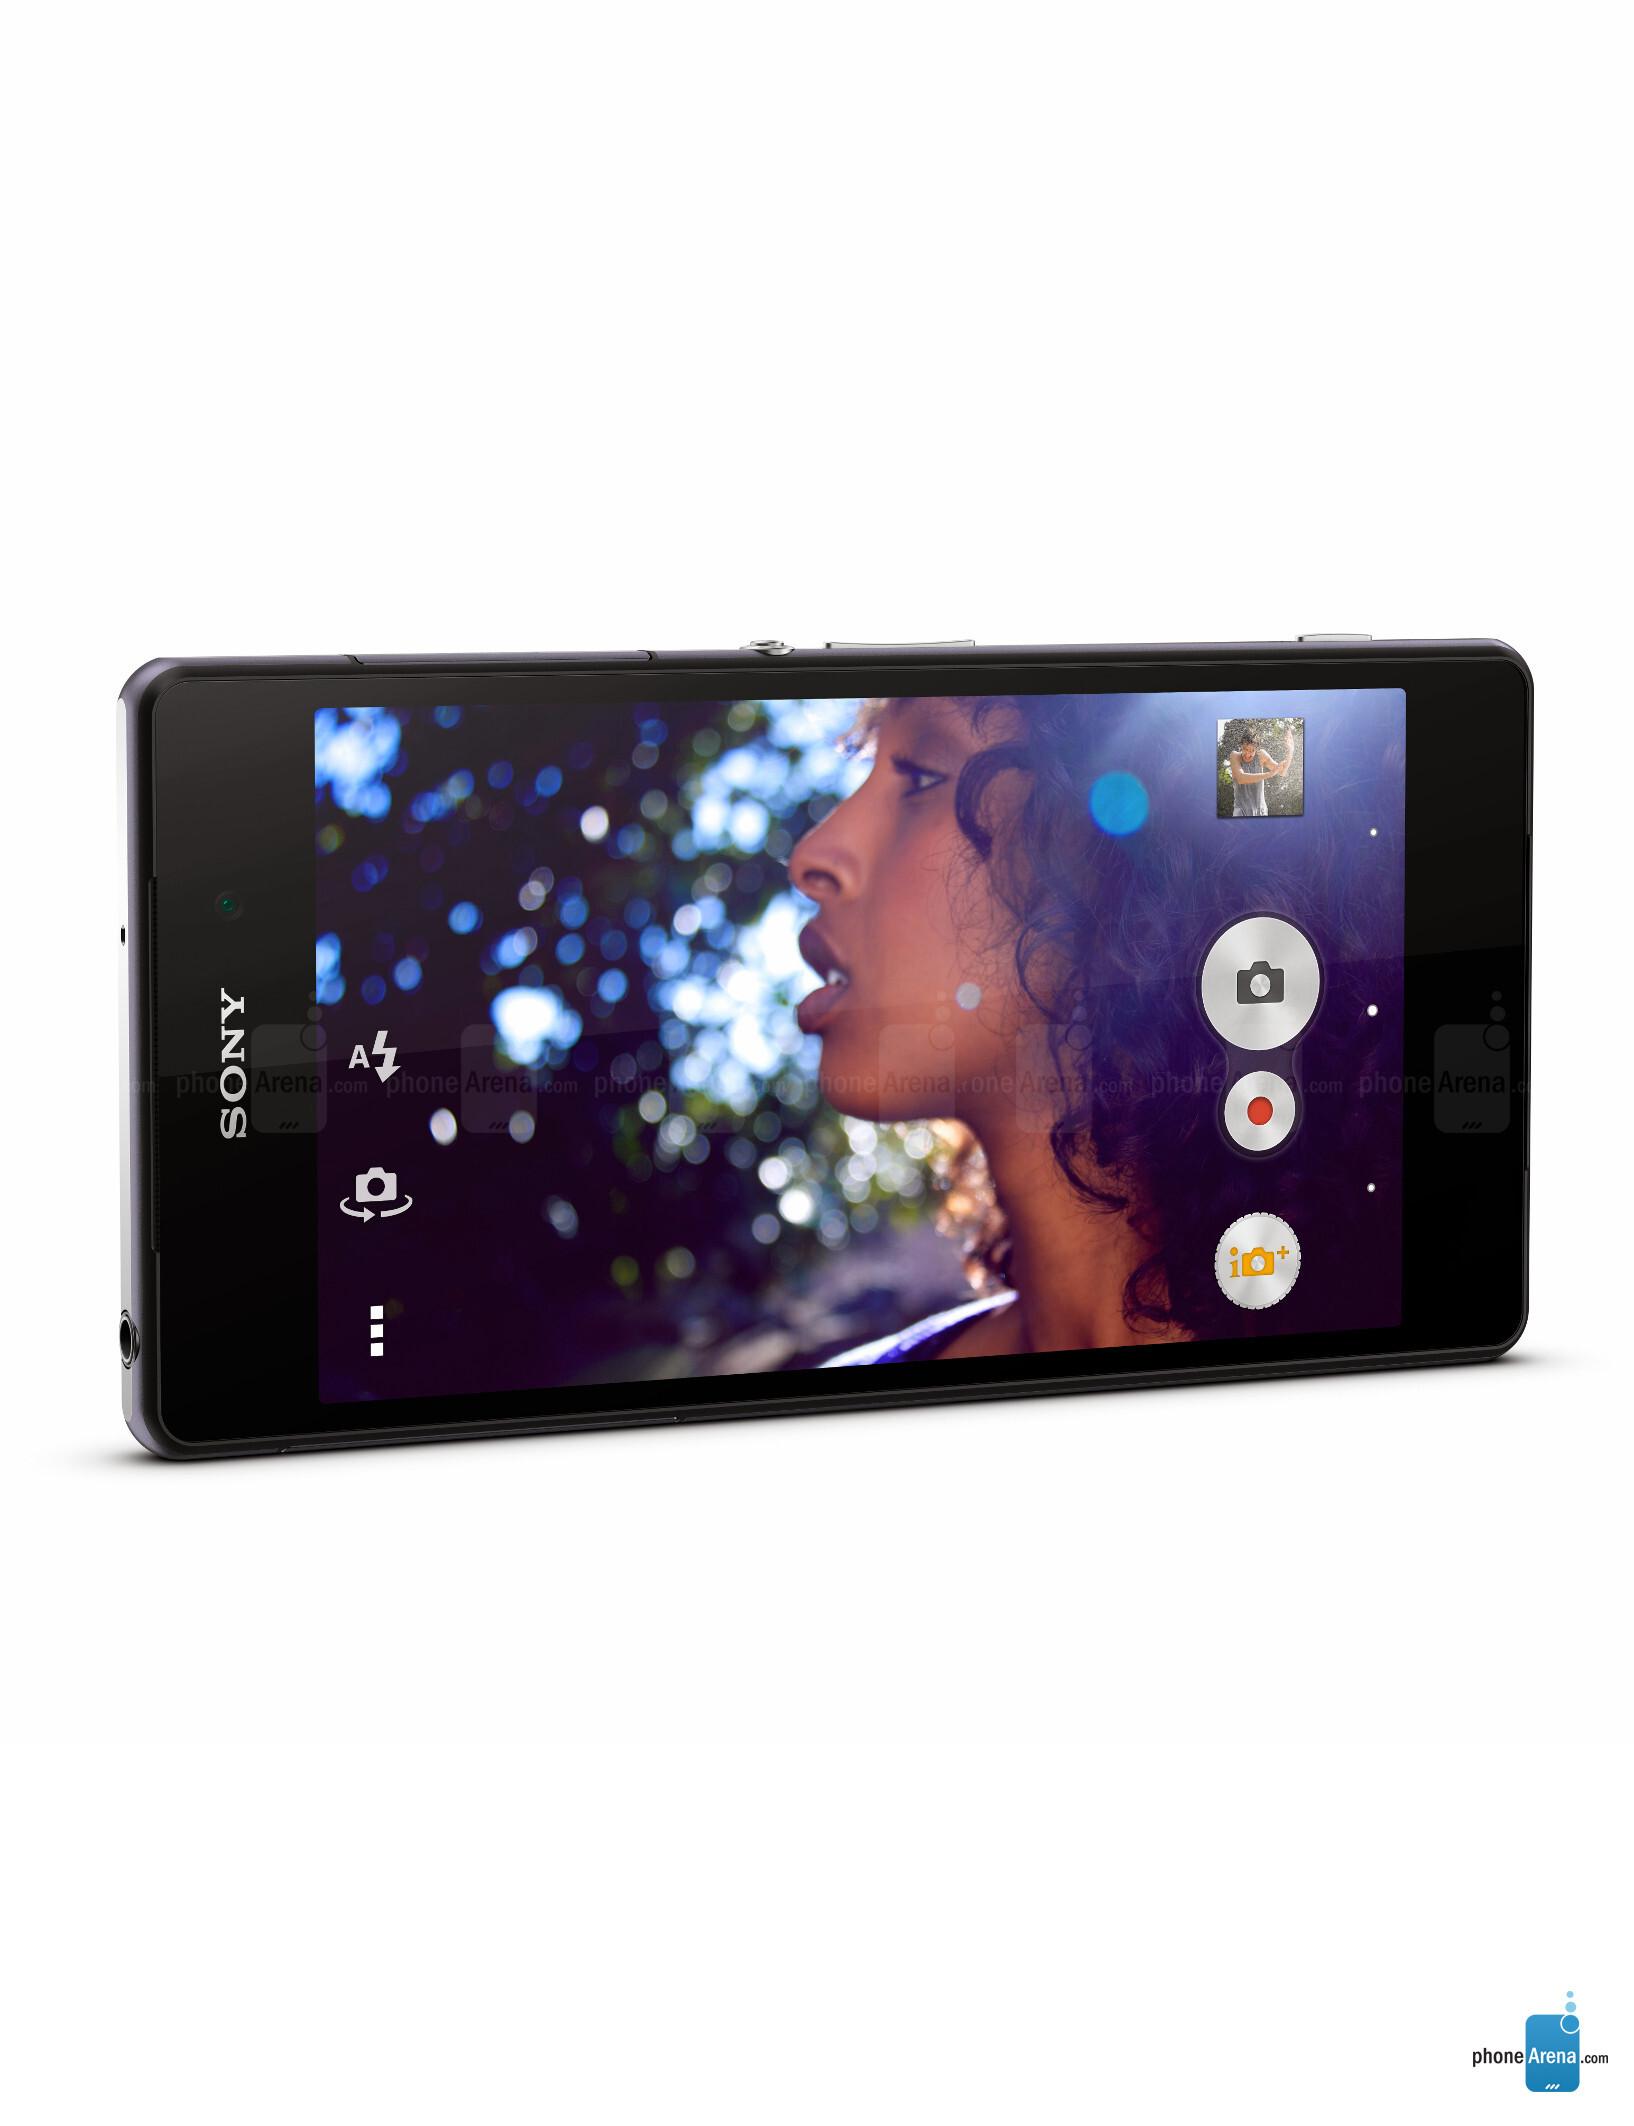 Sony xperia z2 three deals